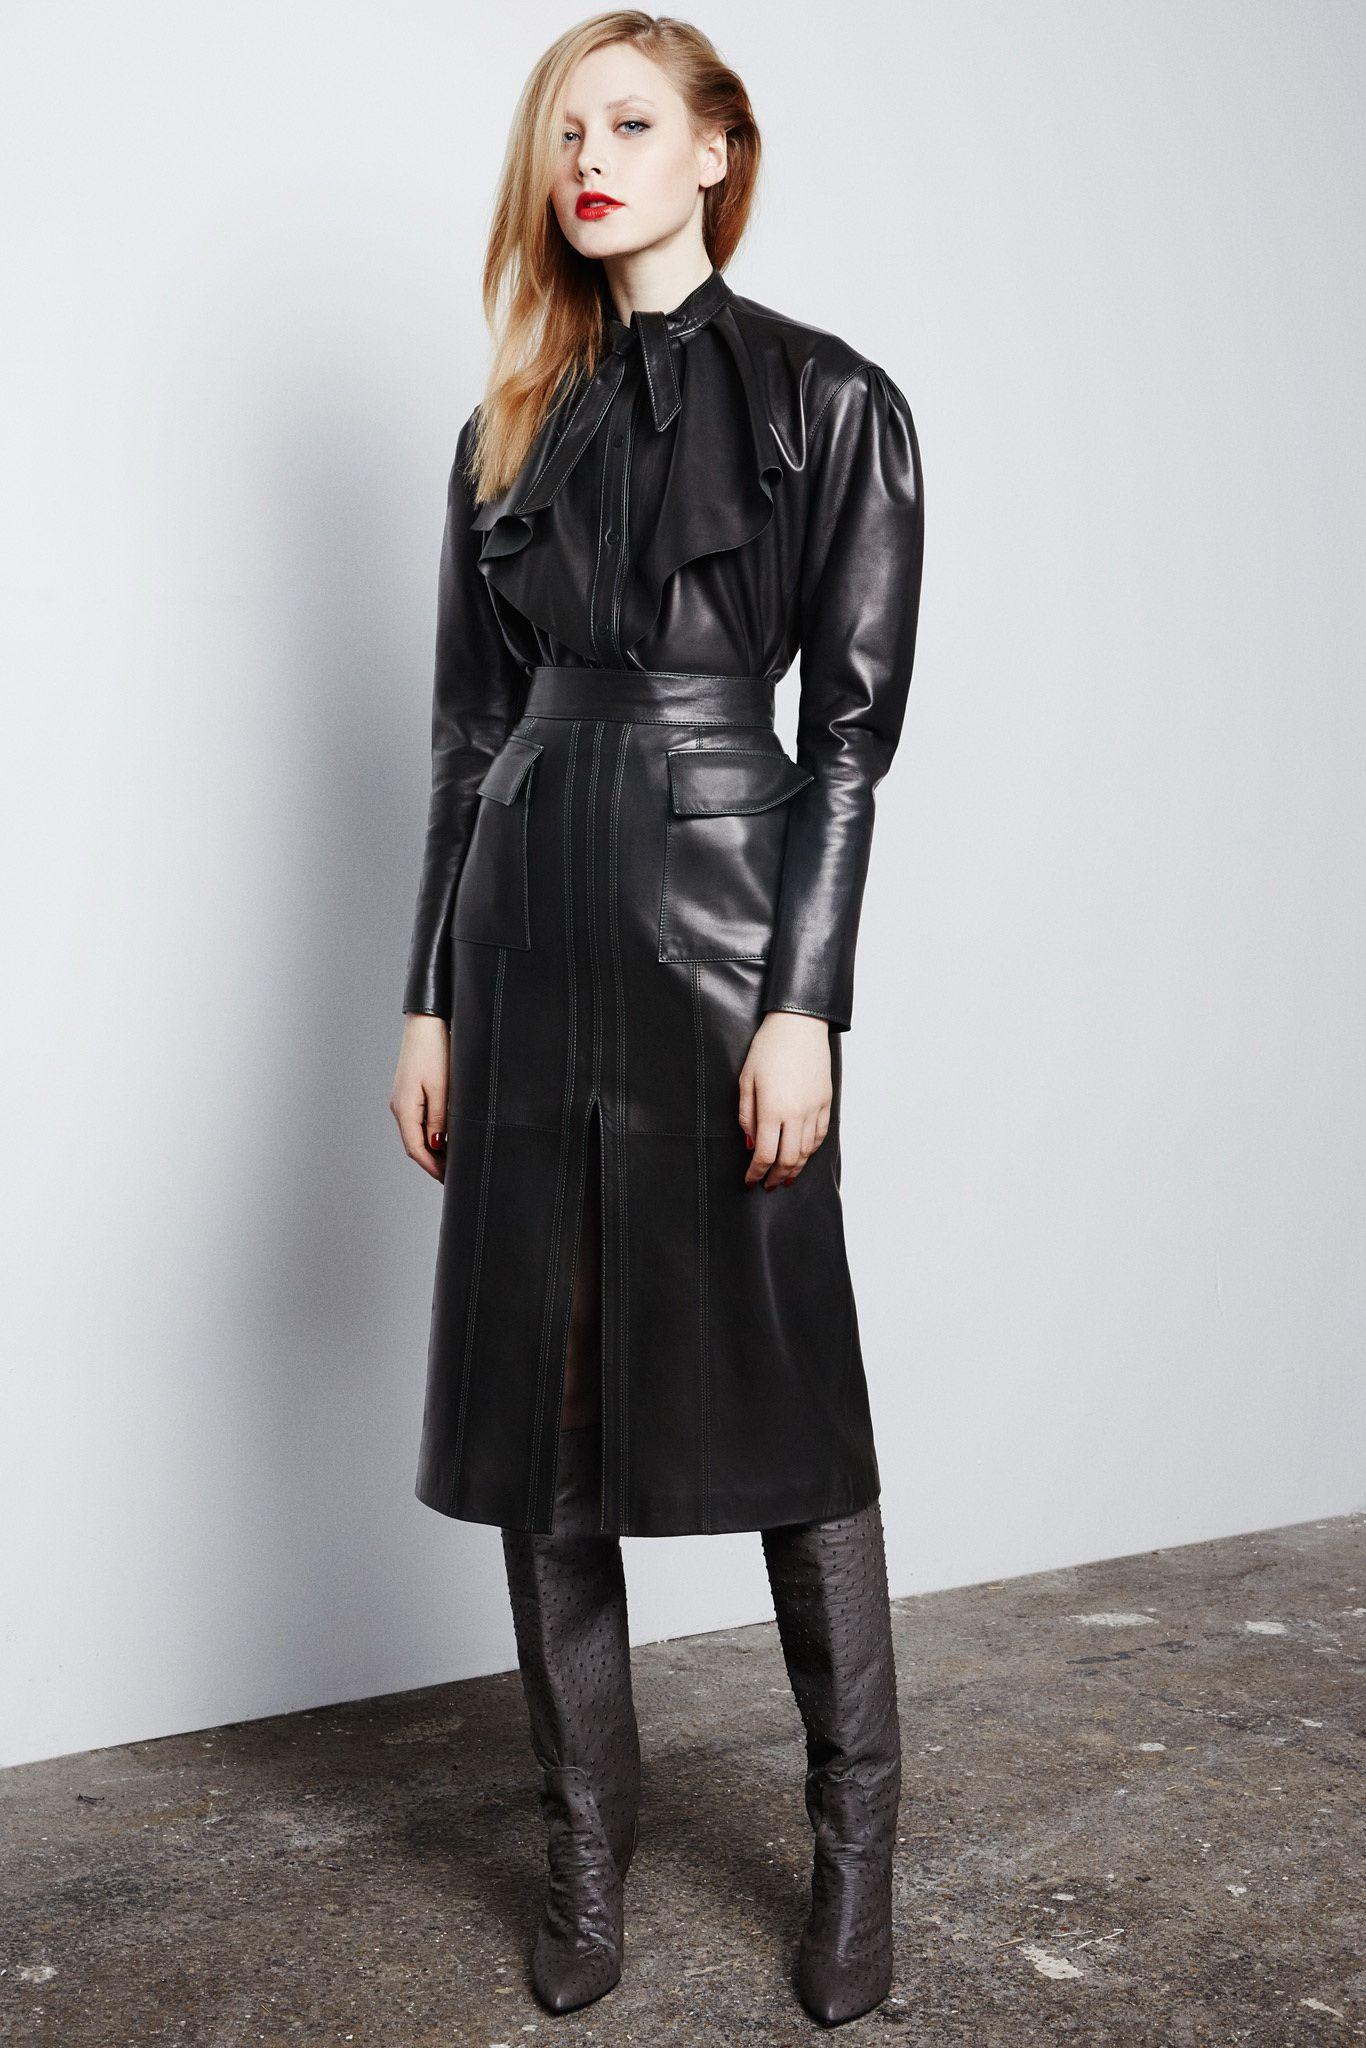 leather skirt suit Gallery | Leather skirt ladies | Pinterest ...